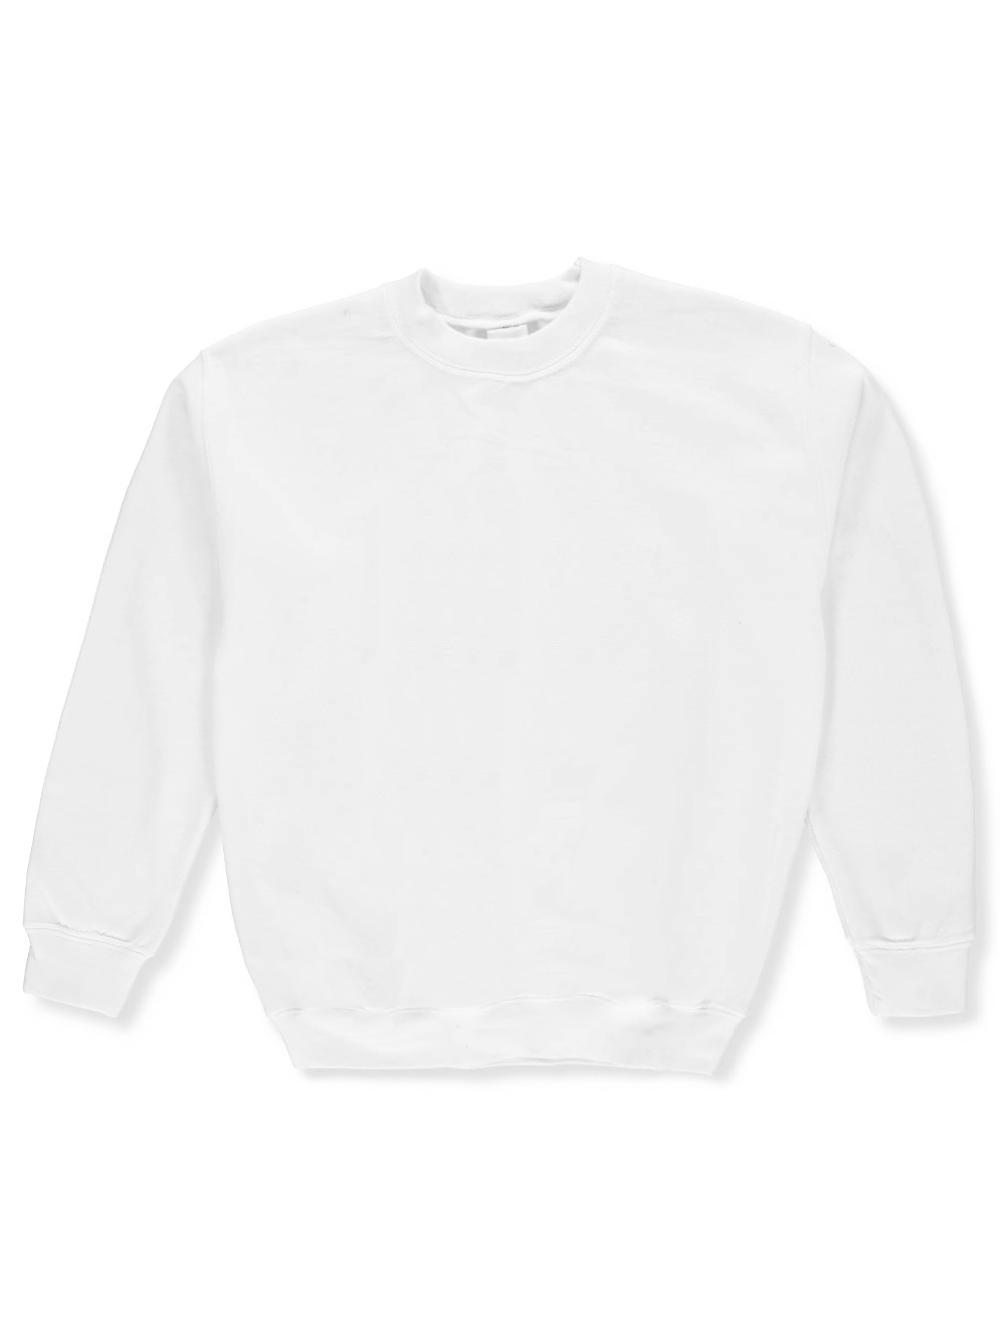 Purple Small Clique Basic Big Boys Comfortable Fleece Sweatshirt